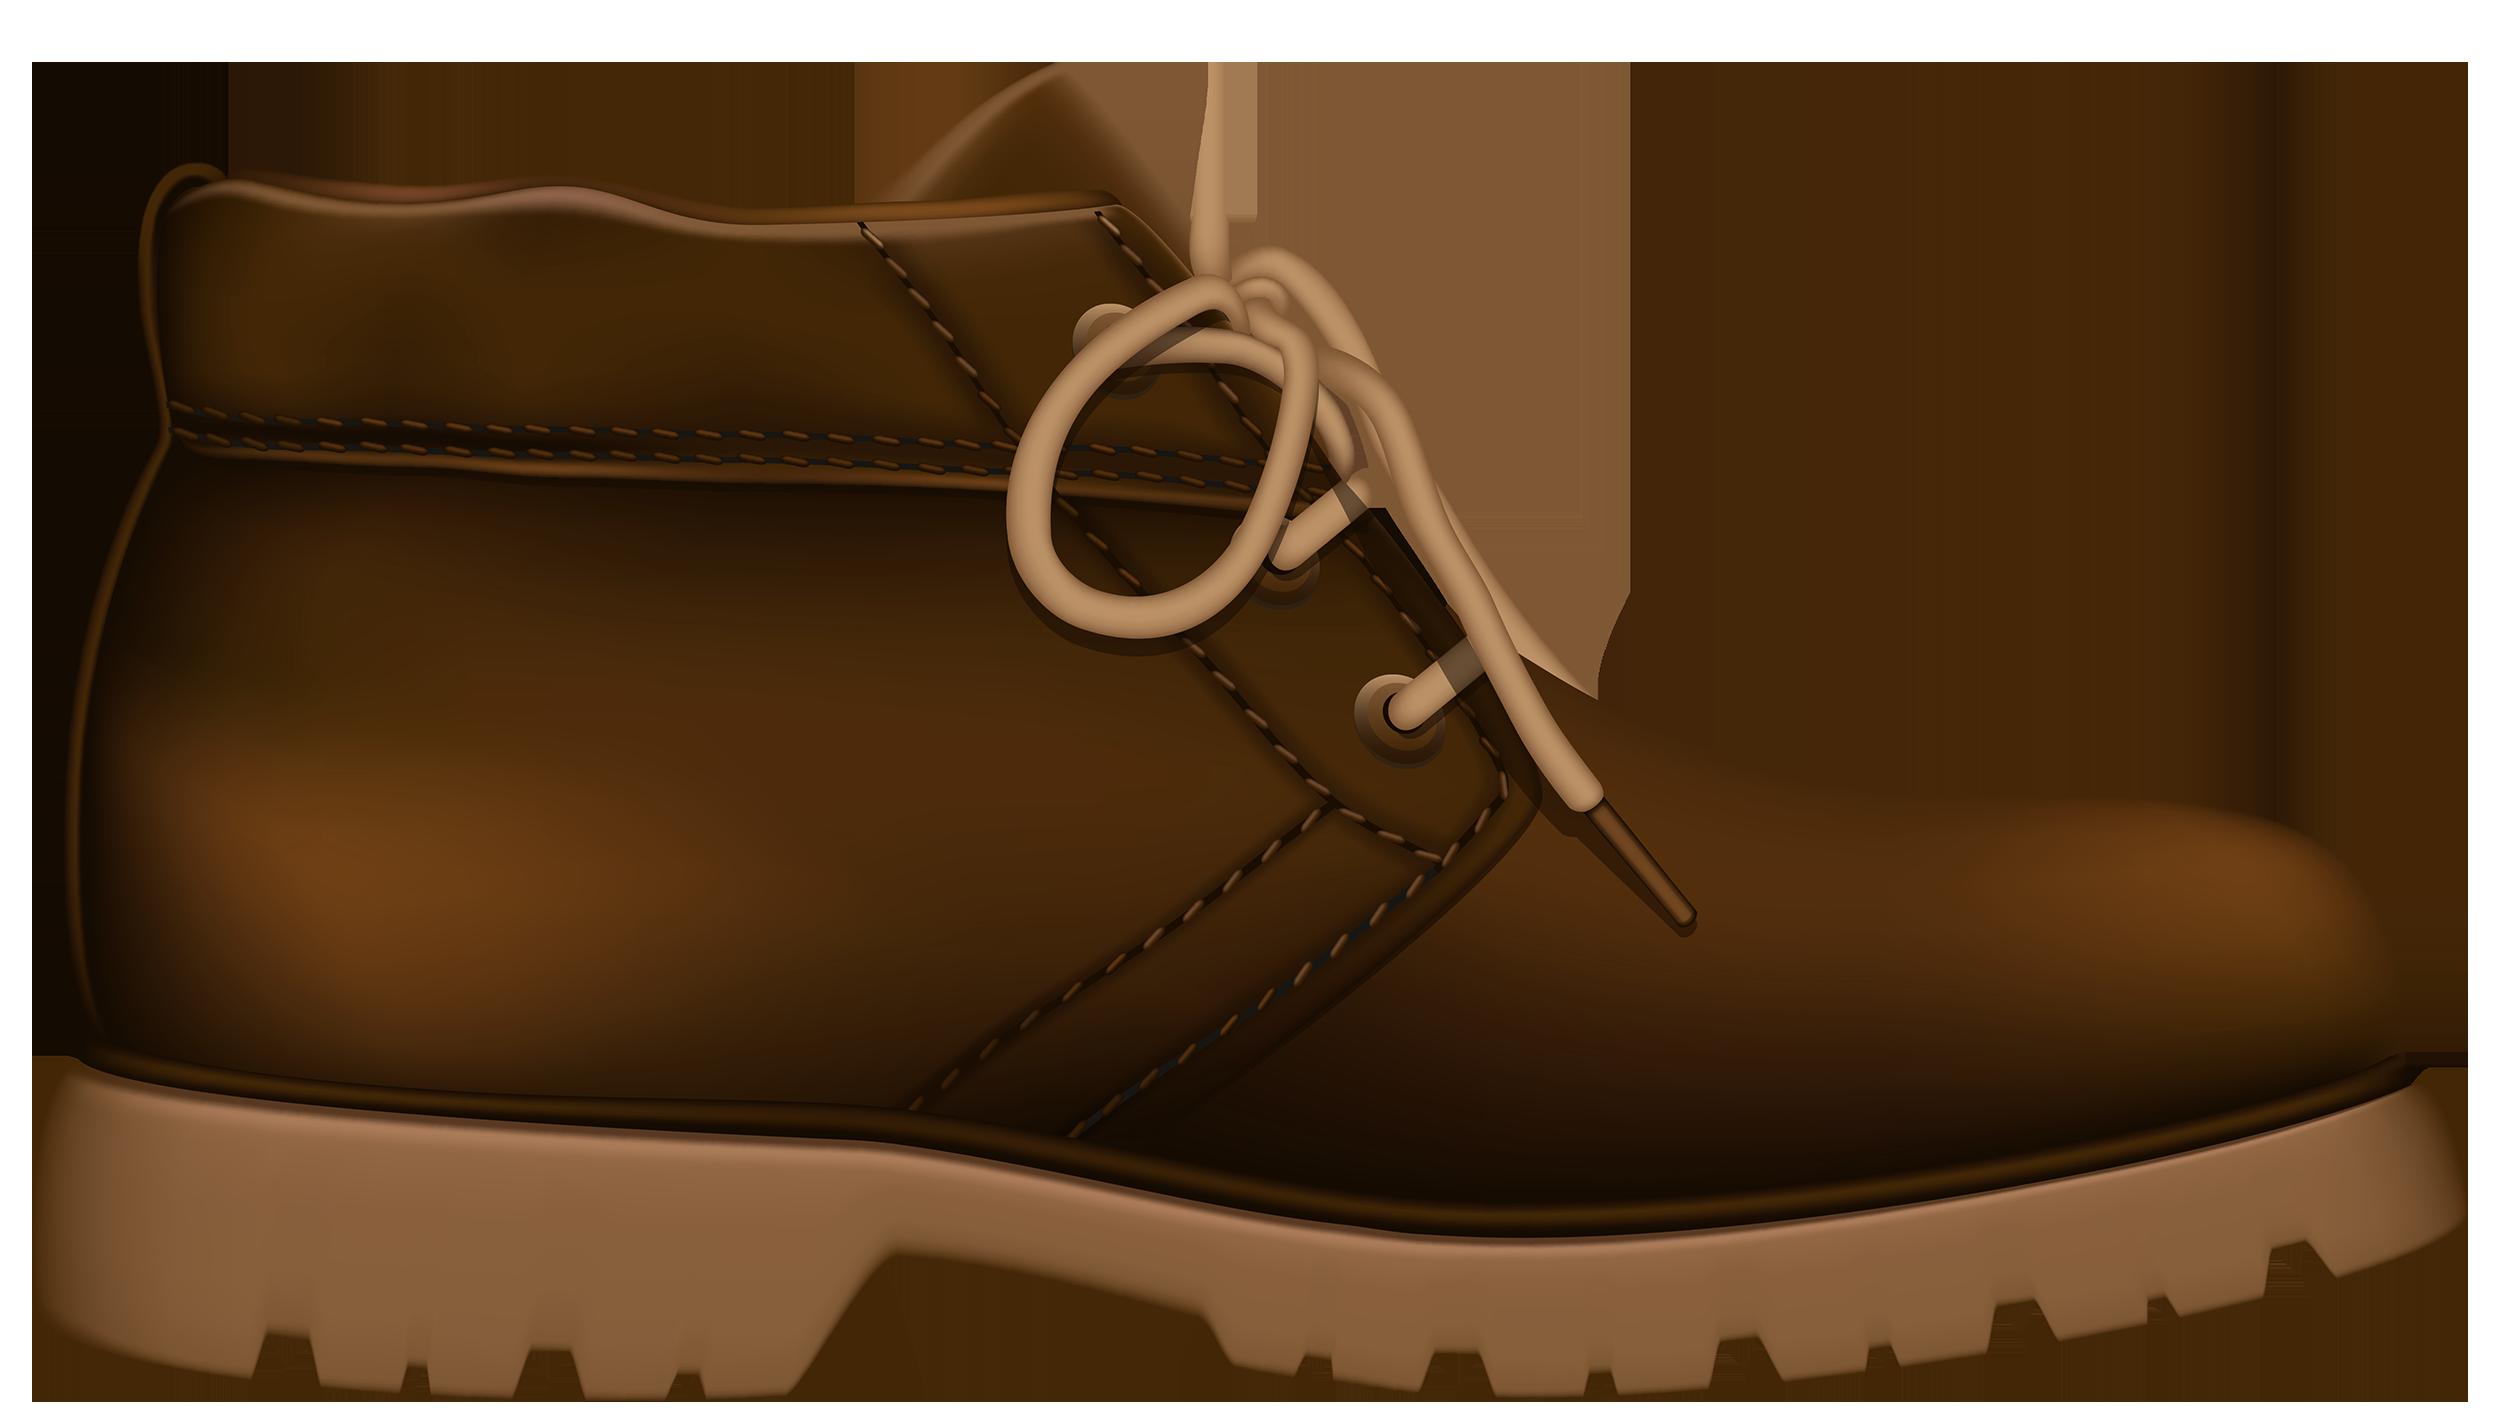 Clipart hat tourist. Brown shoe png best